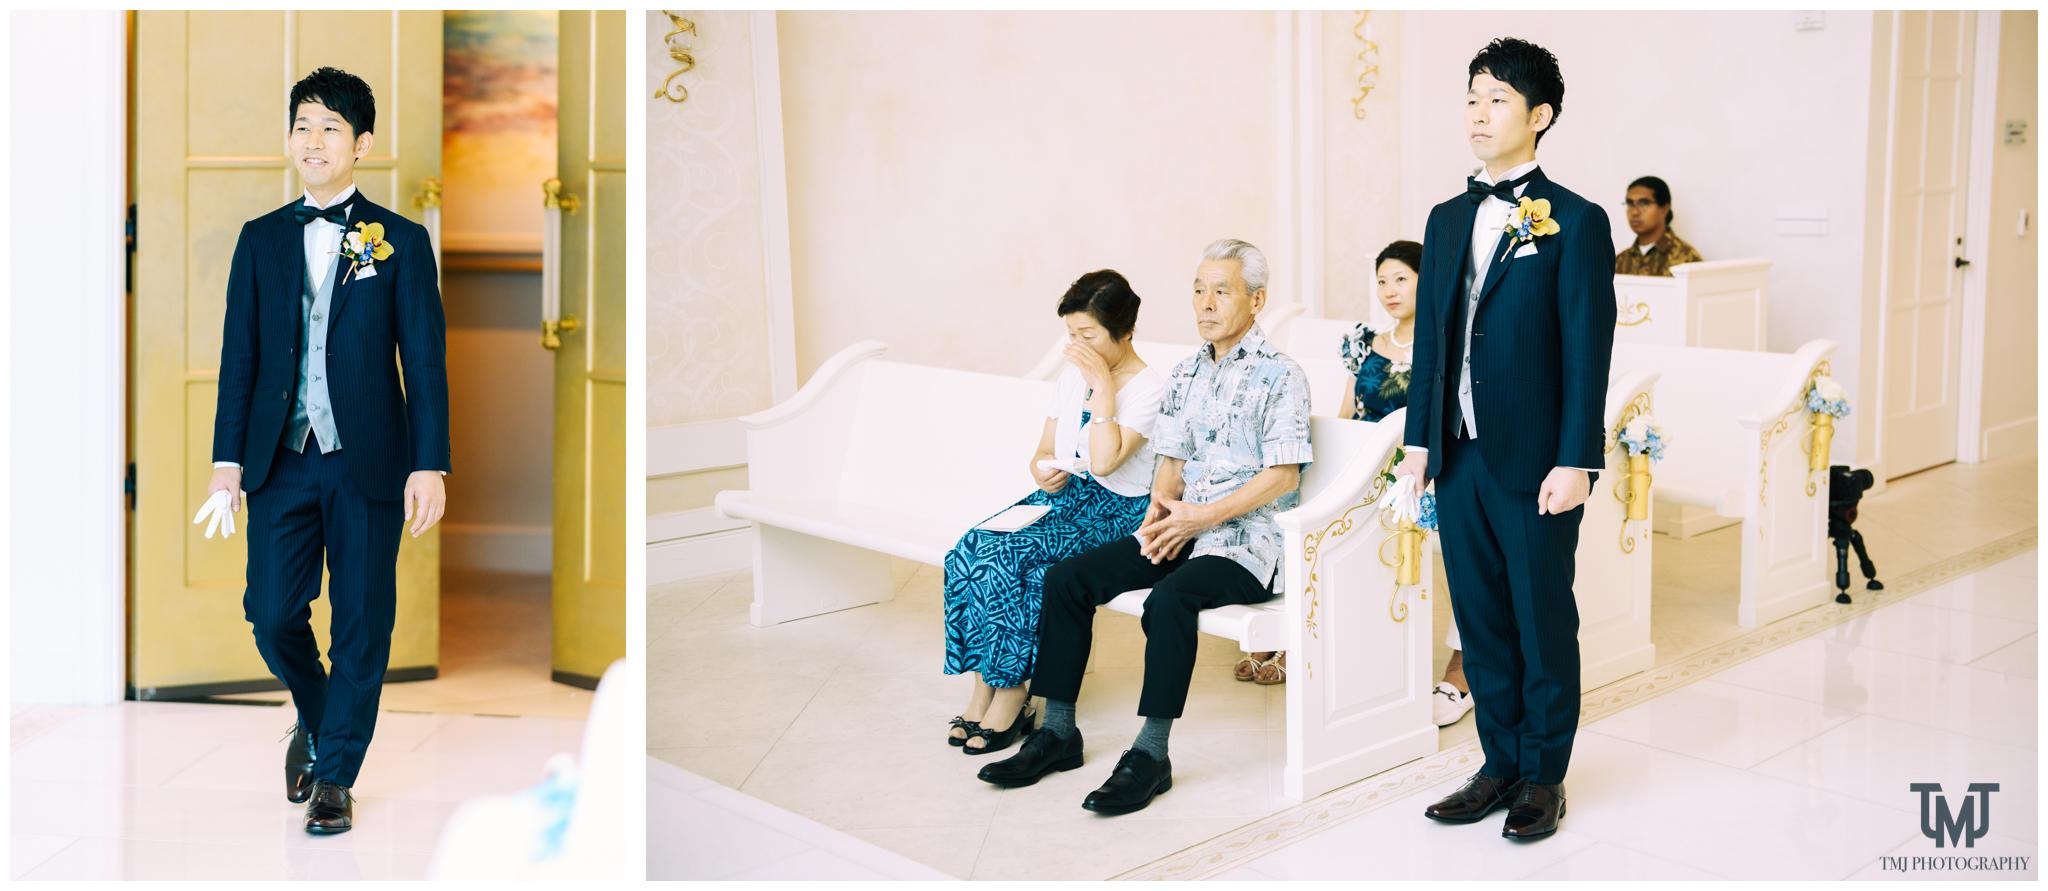 Moana Surfrider Terrace By The Sea Honolulu Destination Wedding 032.jpg